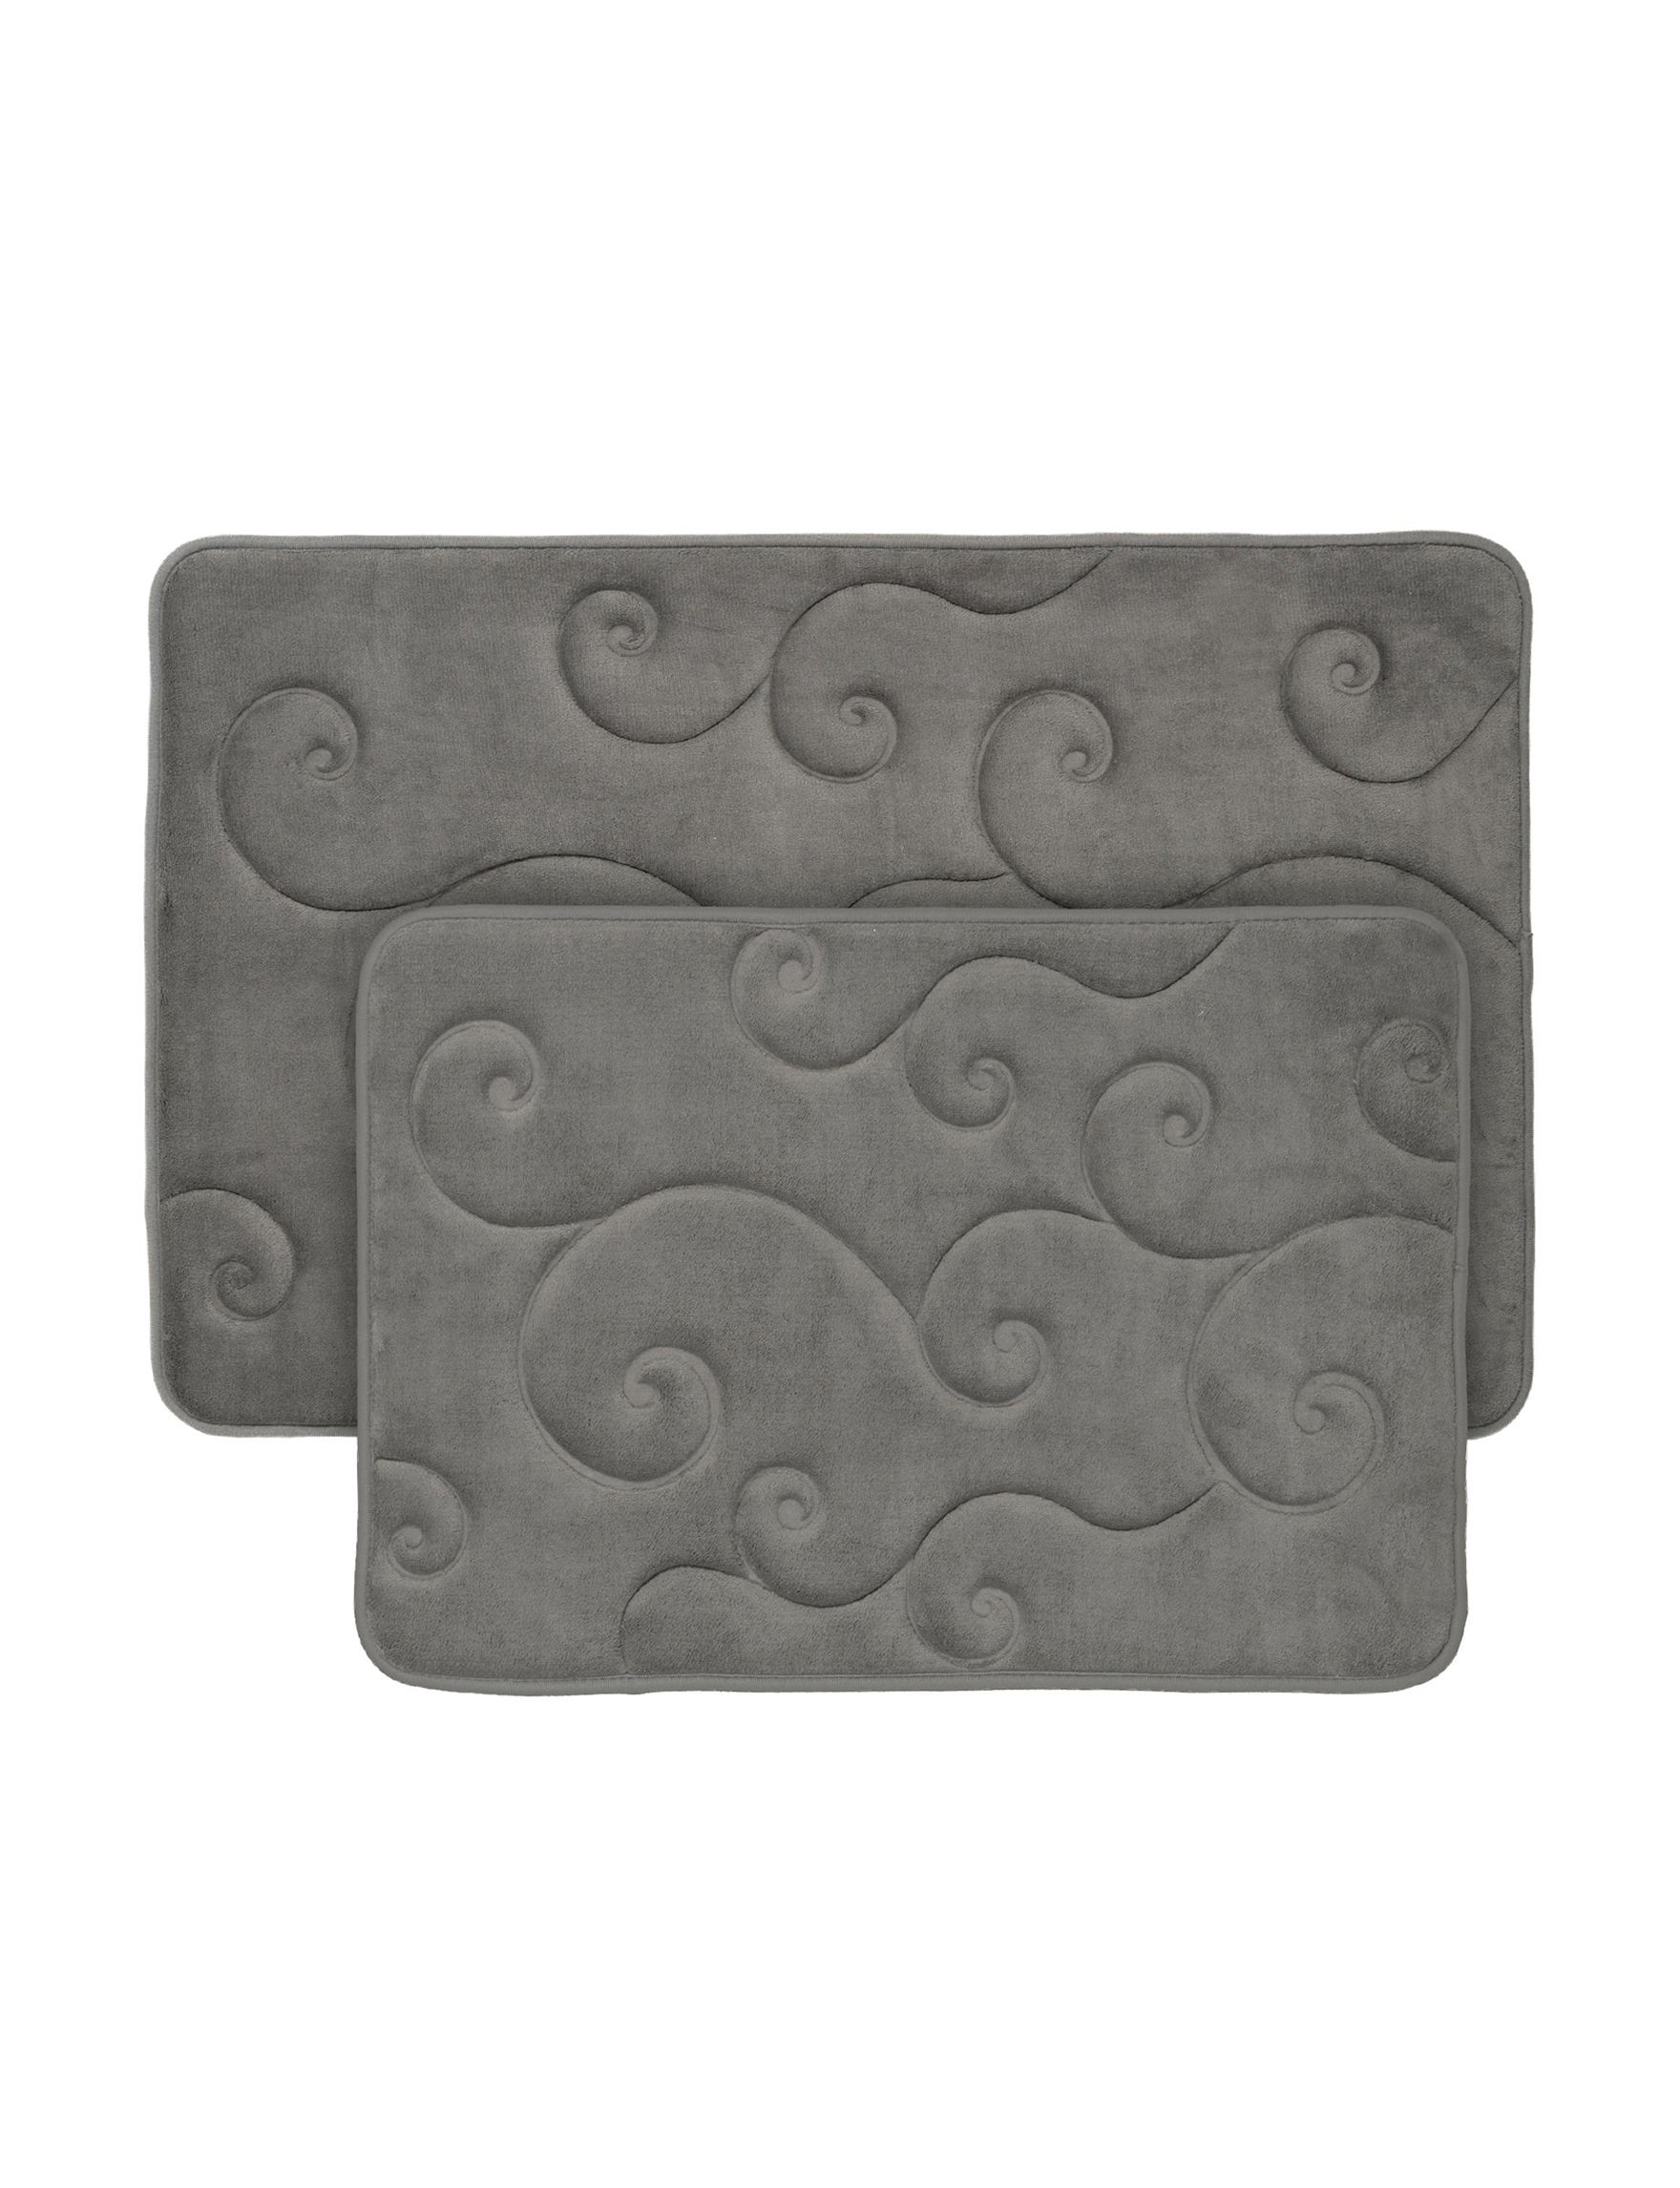 Lavish Home Platinum Bath Rugs & Mats